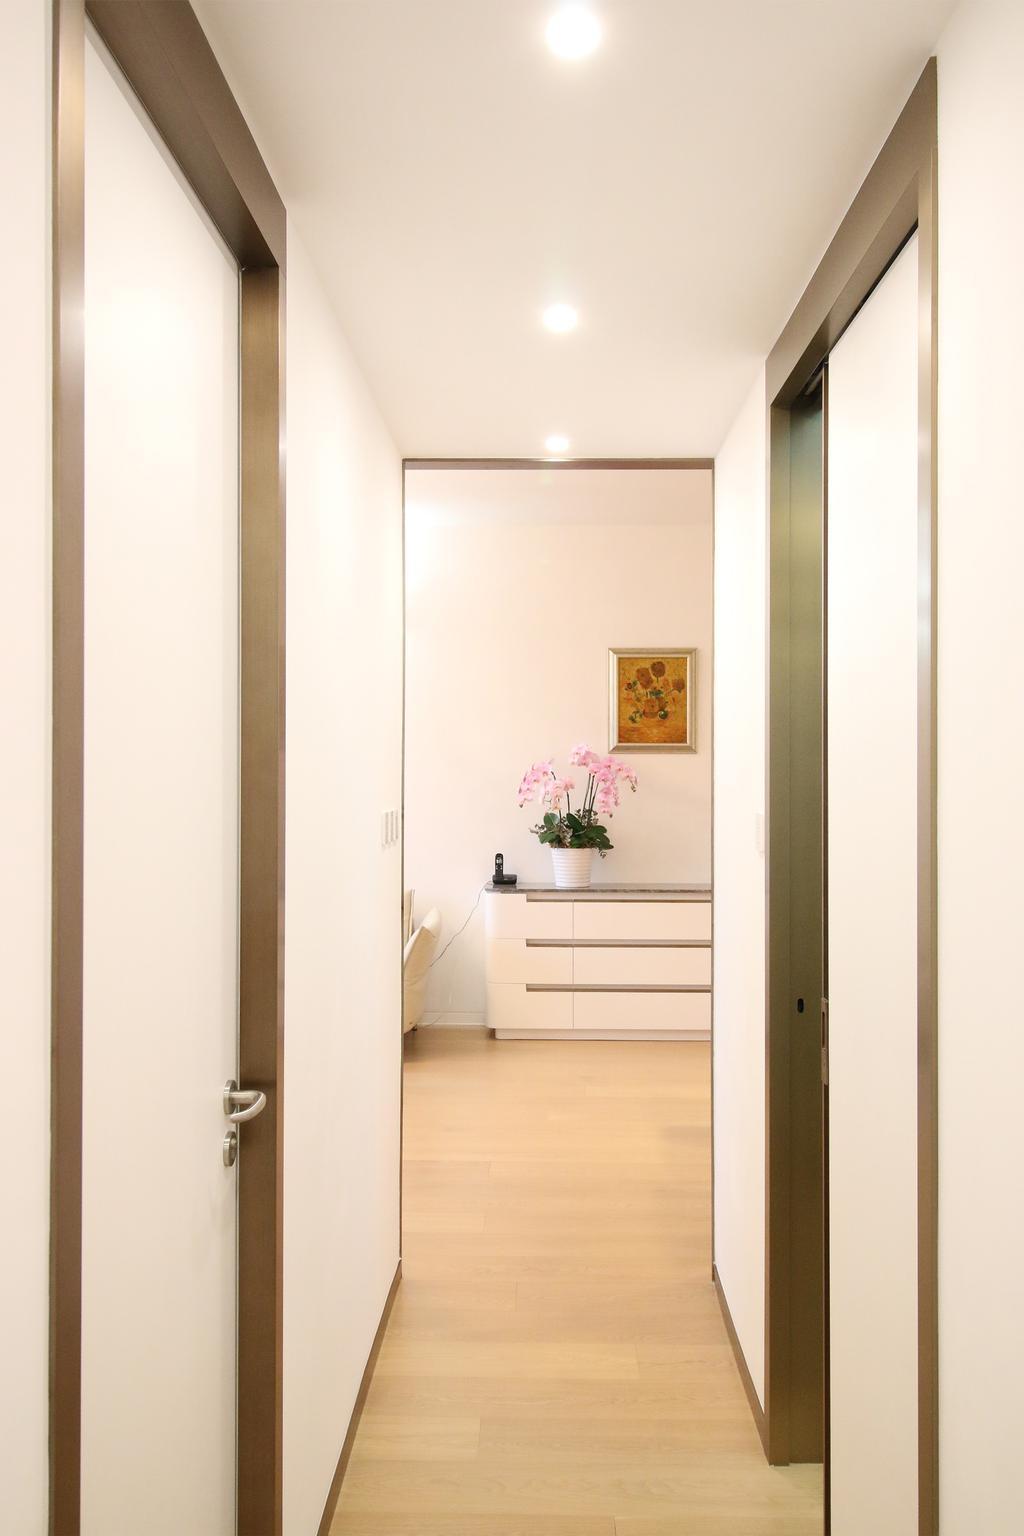 傳統, 私家樓, 客廳, 逸樺園, 室內設計師, EMCS, Furniture, Sideboard